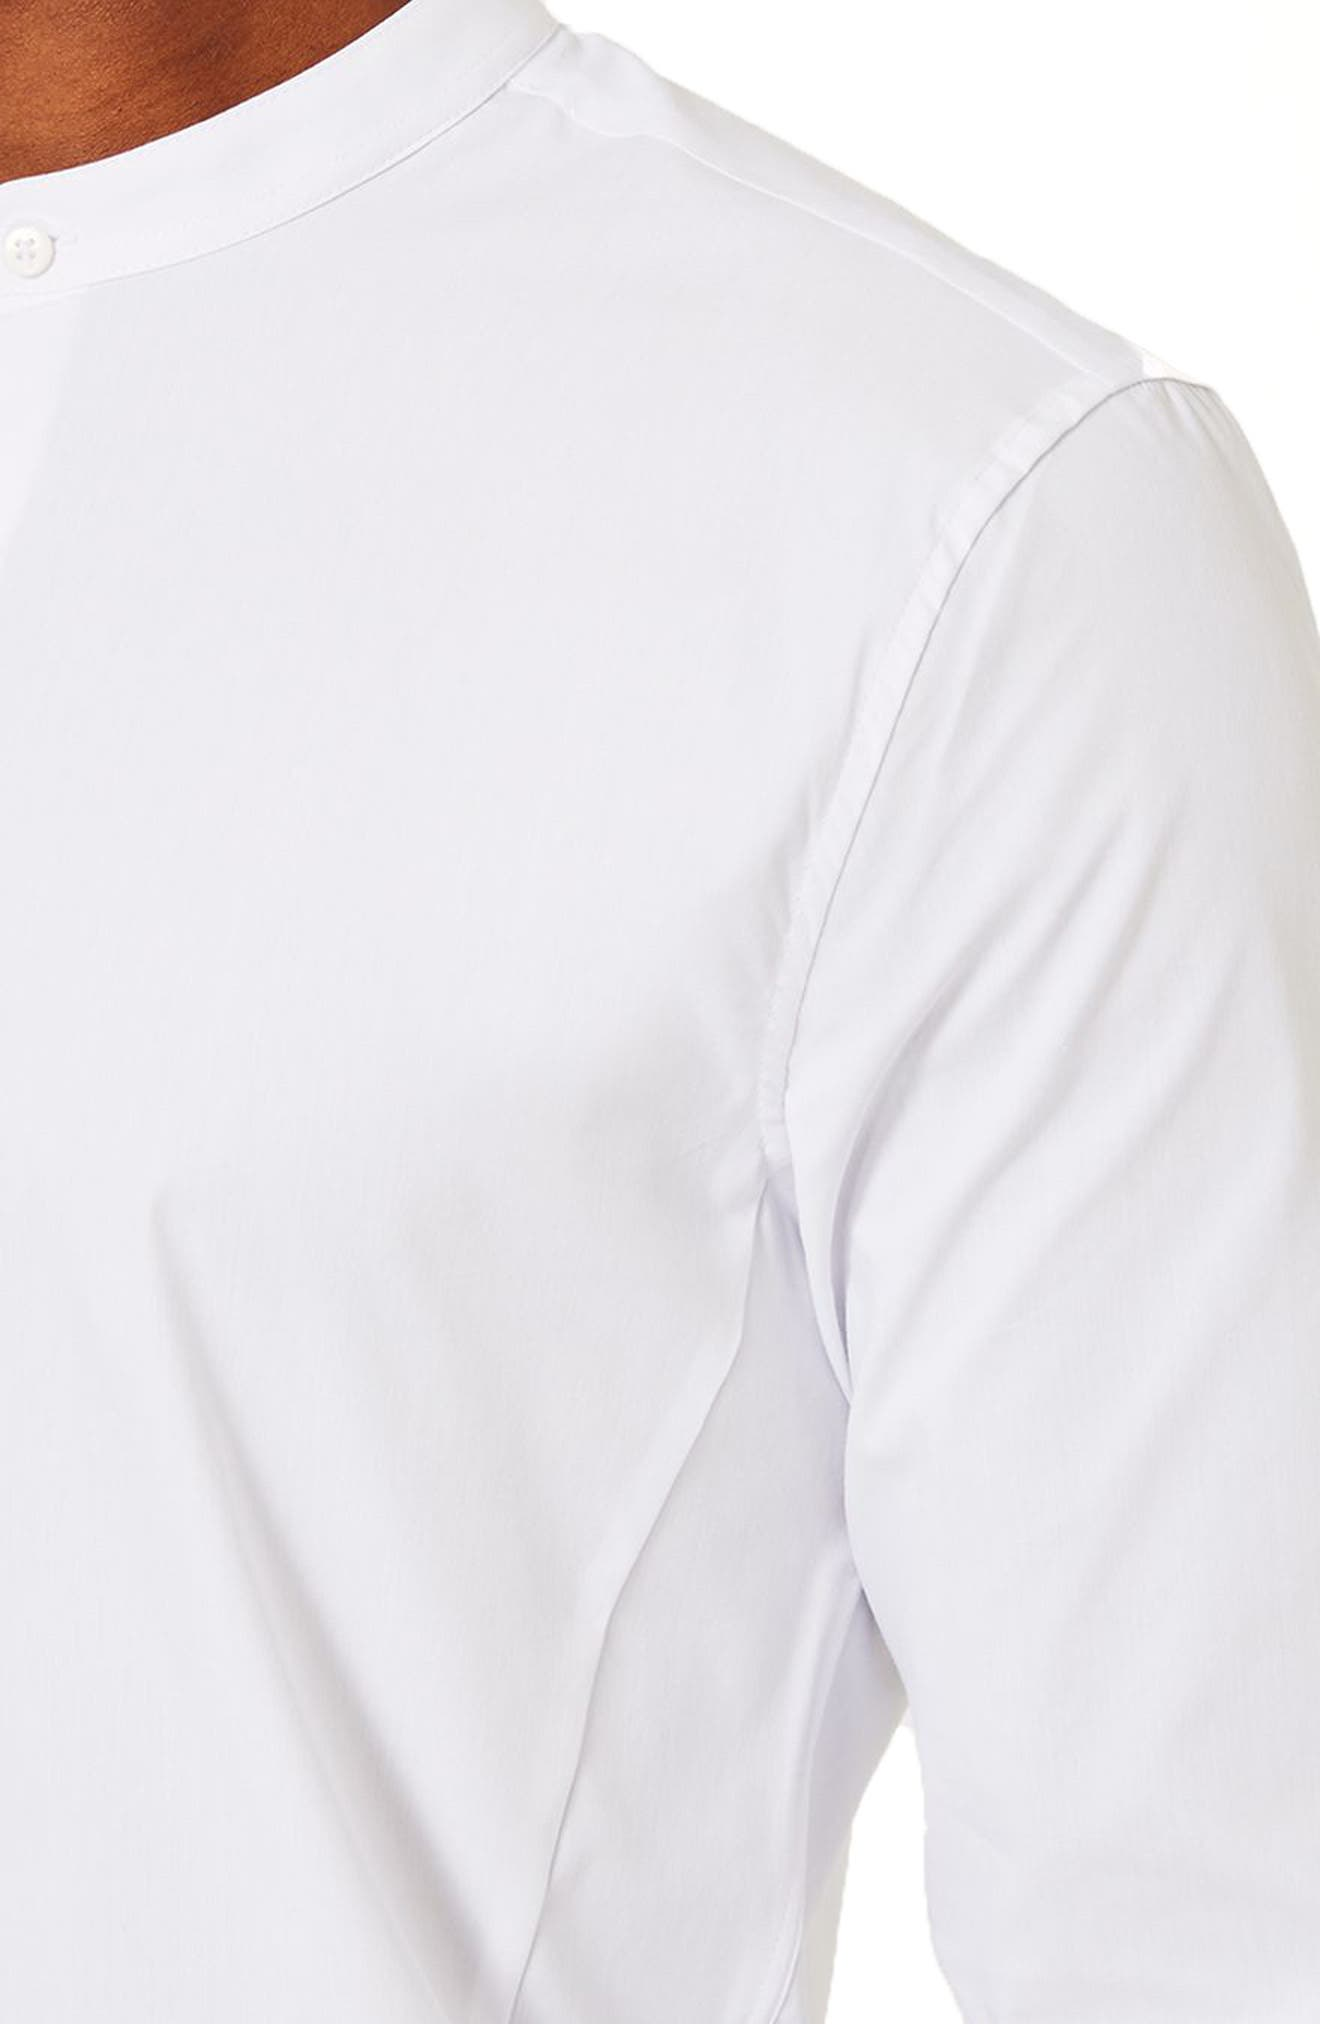 Band Collar Skinny Fit Dress Shirt,                             Alternate thumbnail 2, color,                             White